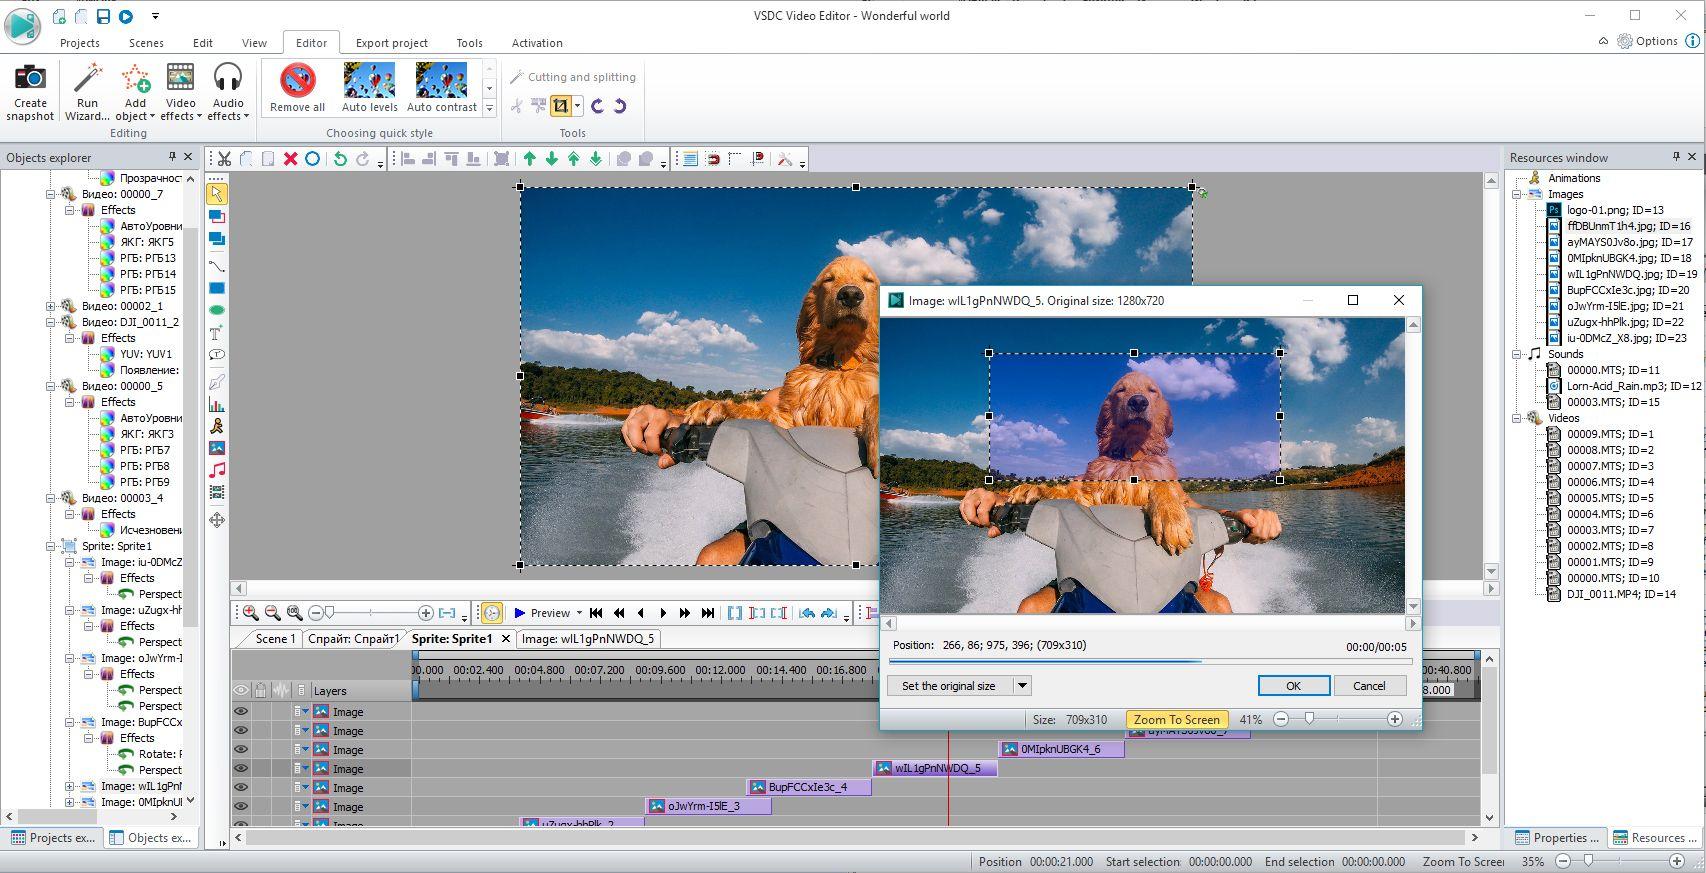 vsdc free video editor3